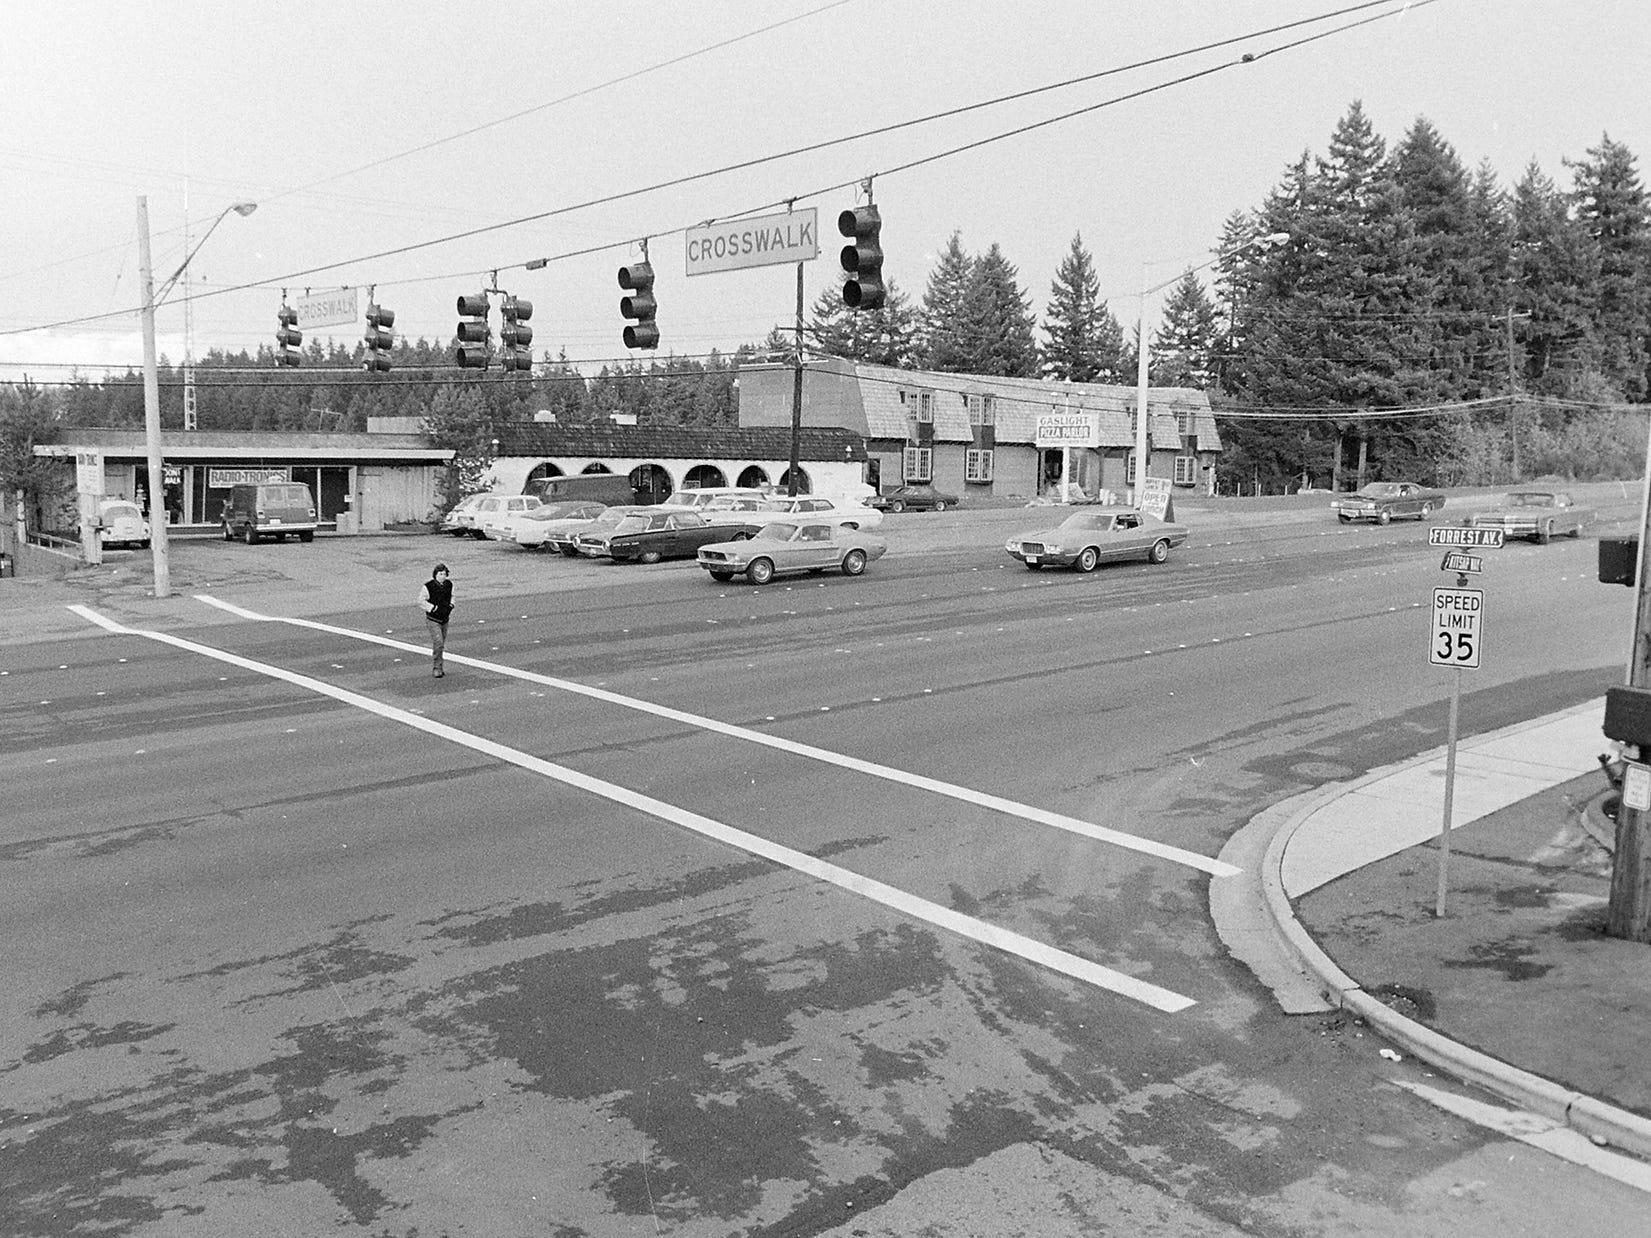 11/22/73New Kitsap Way Crosswalk